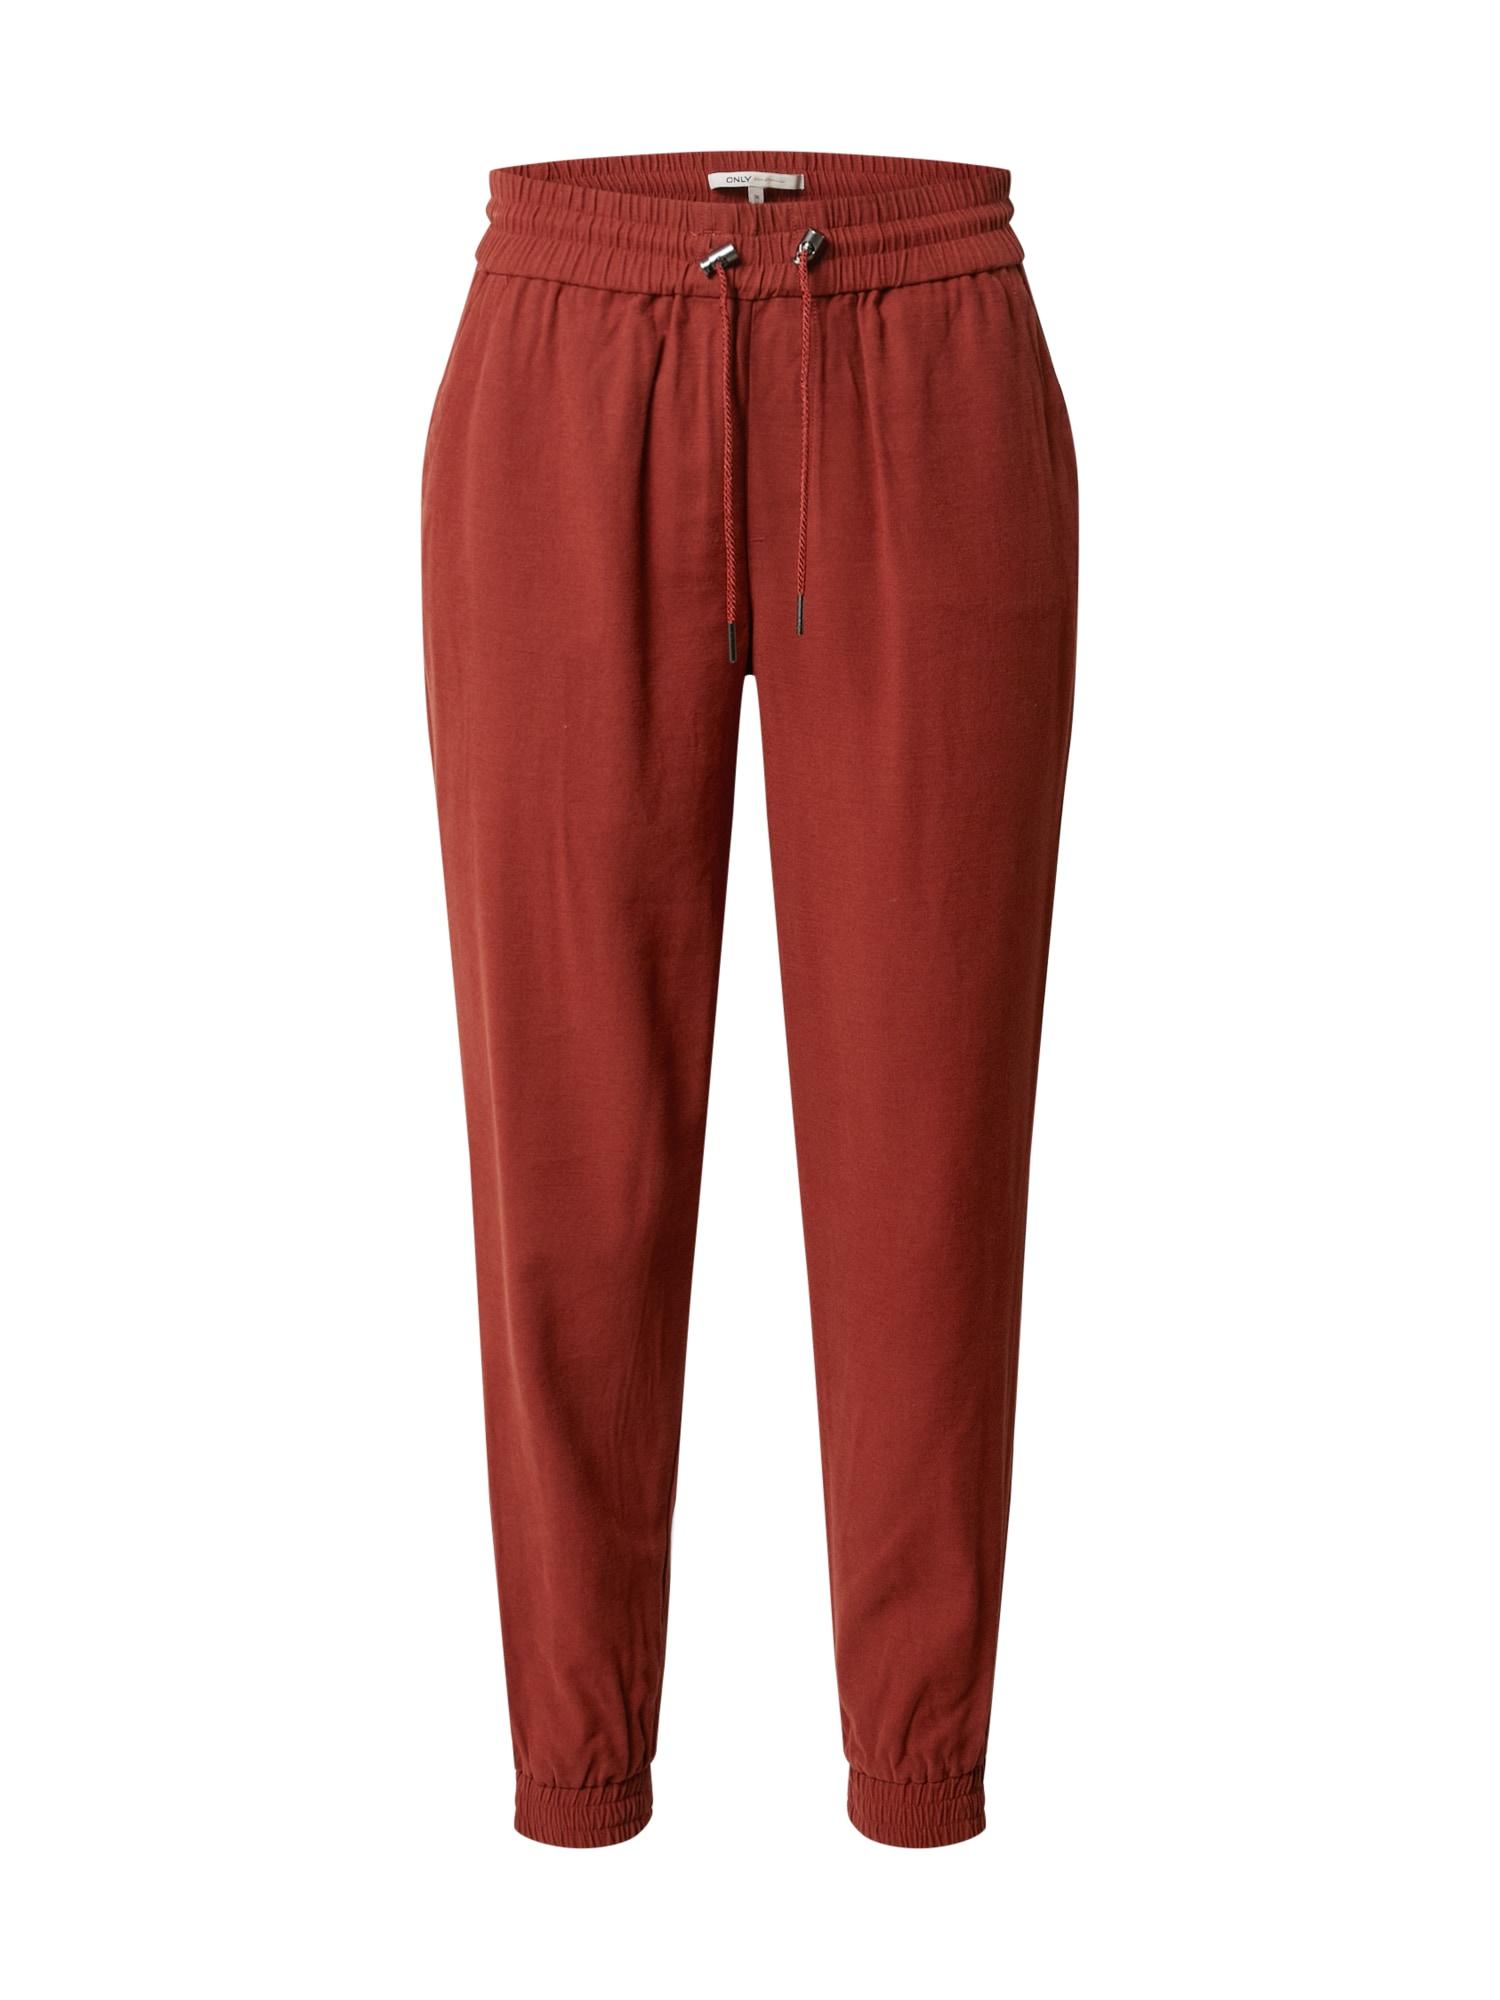 ONLY Plisované nohavice 'Kelda-Emery'  hnedé